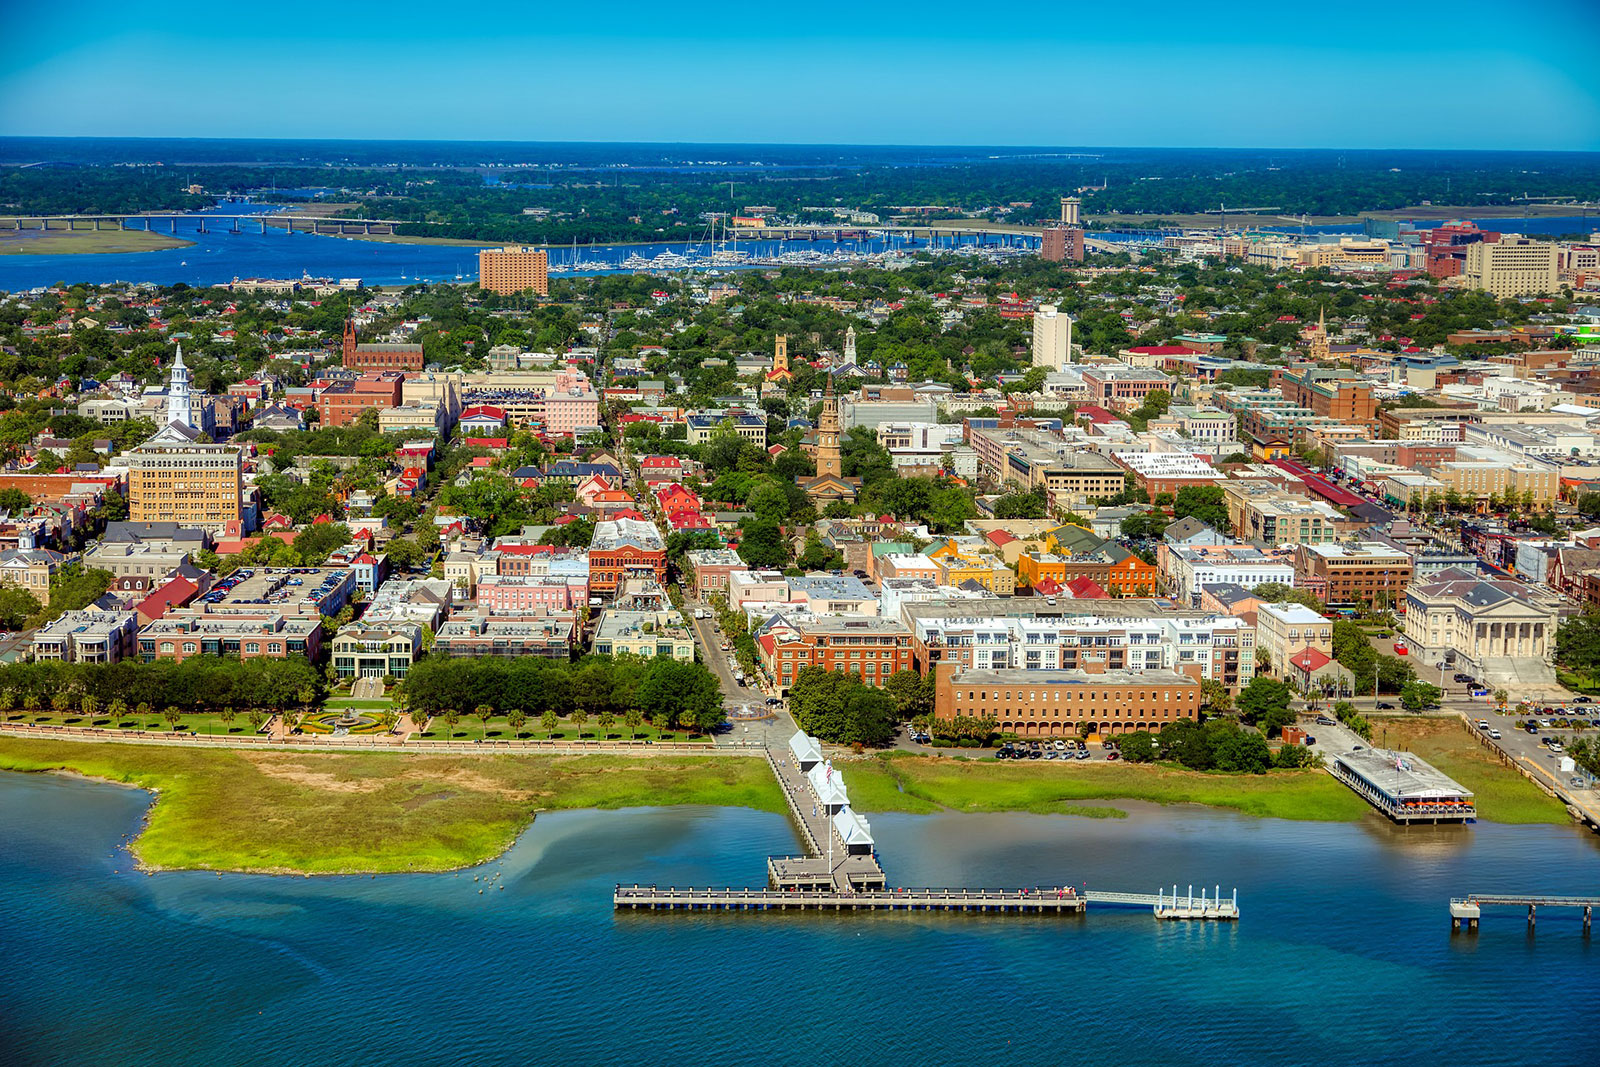 Charleston, South Carolina – the US's surprise tech start-up city